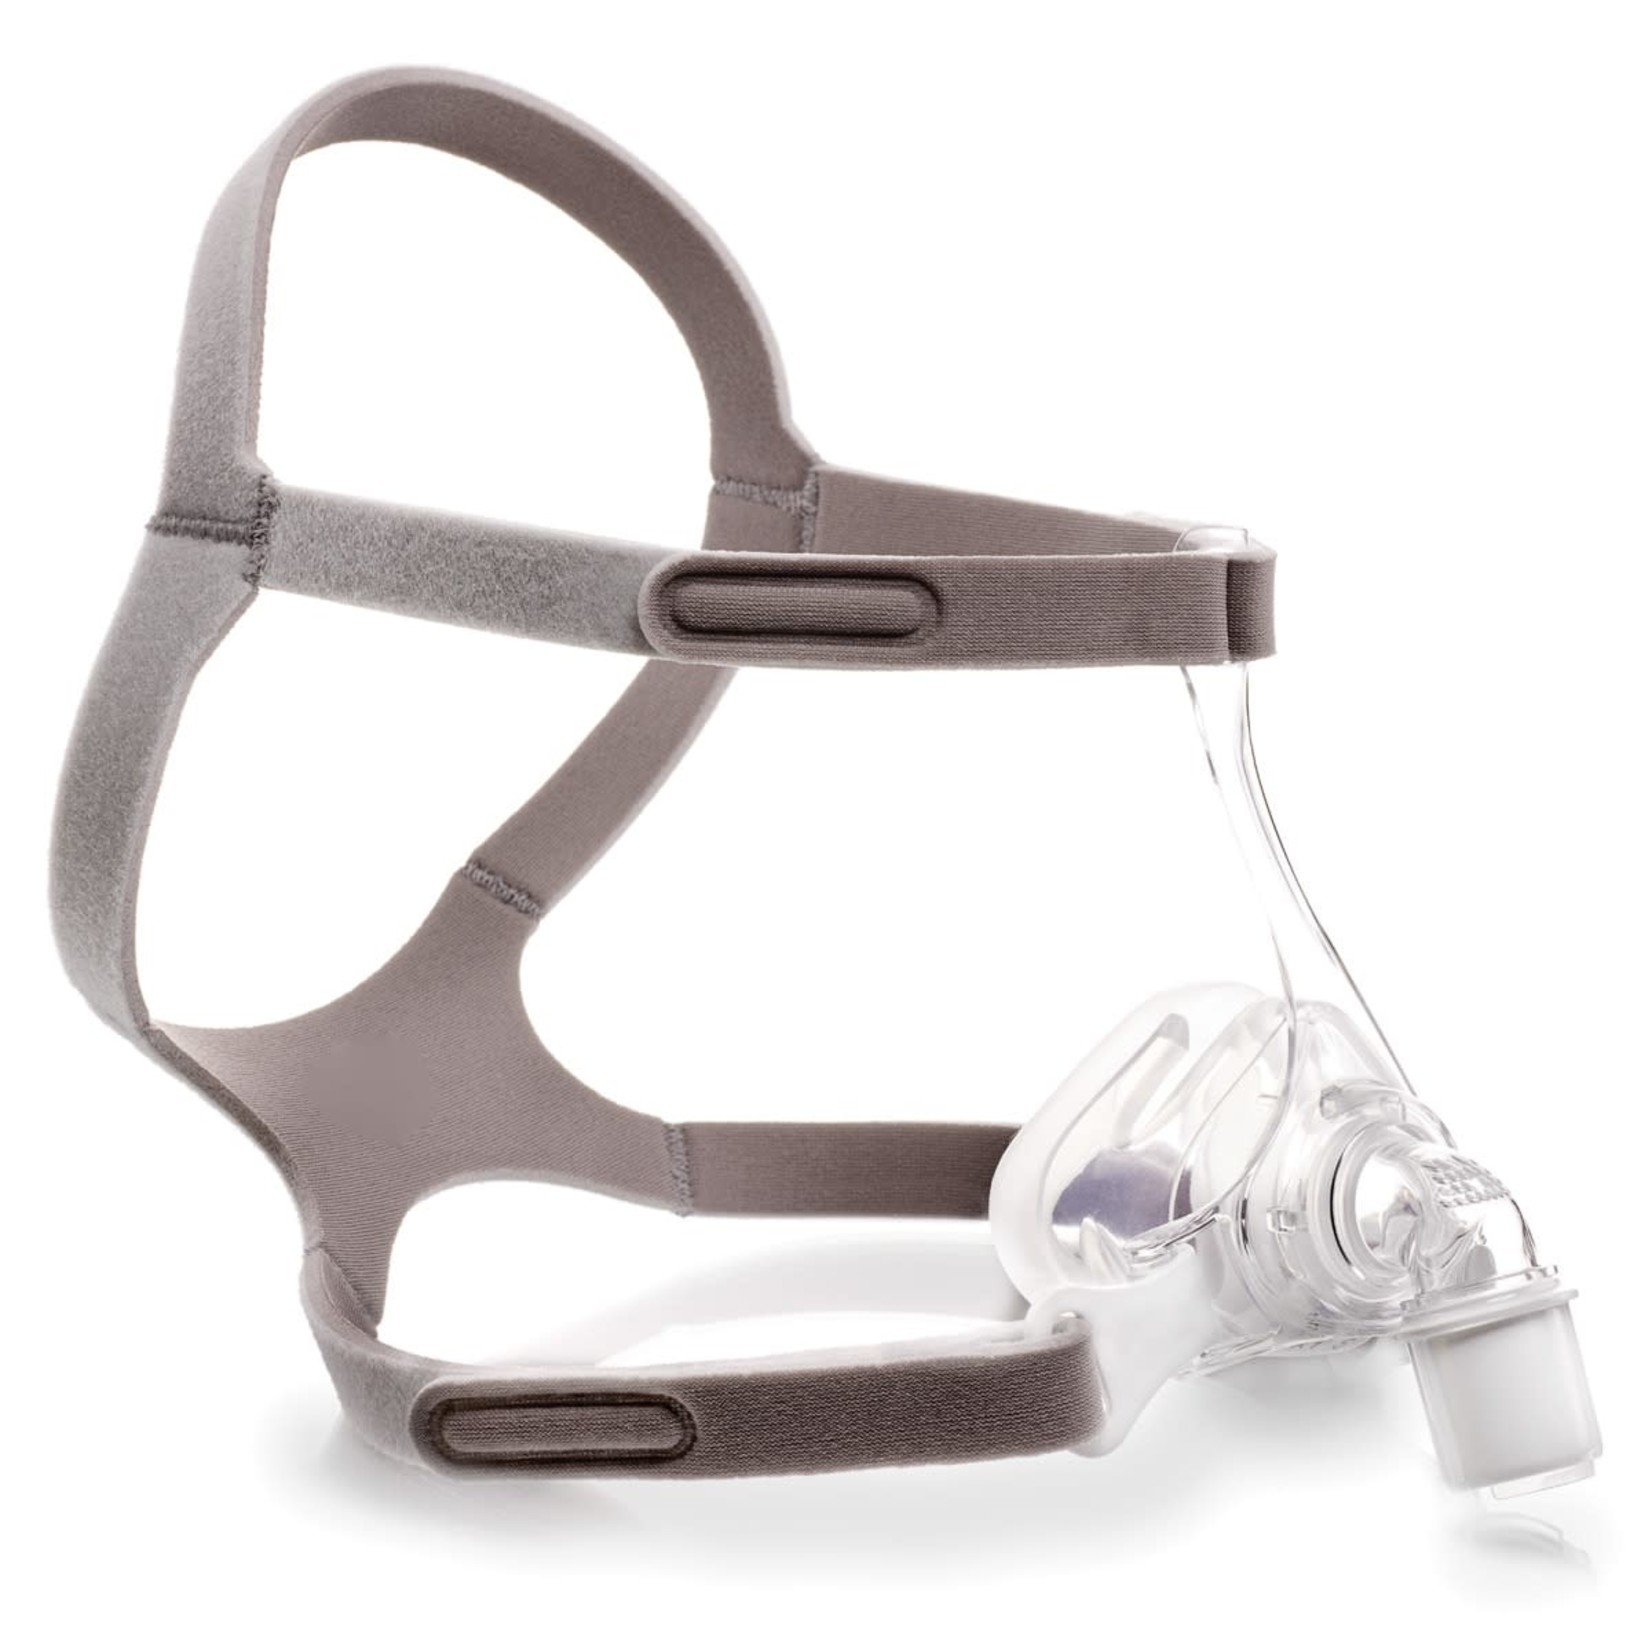 RESPIRONICS Pico Nasal CPAP Mask